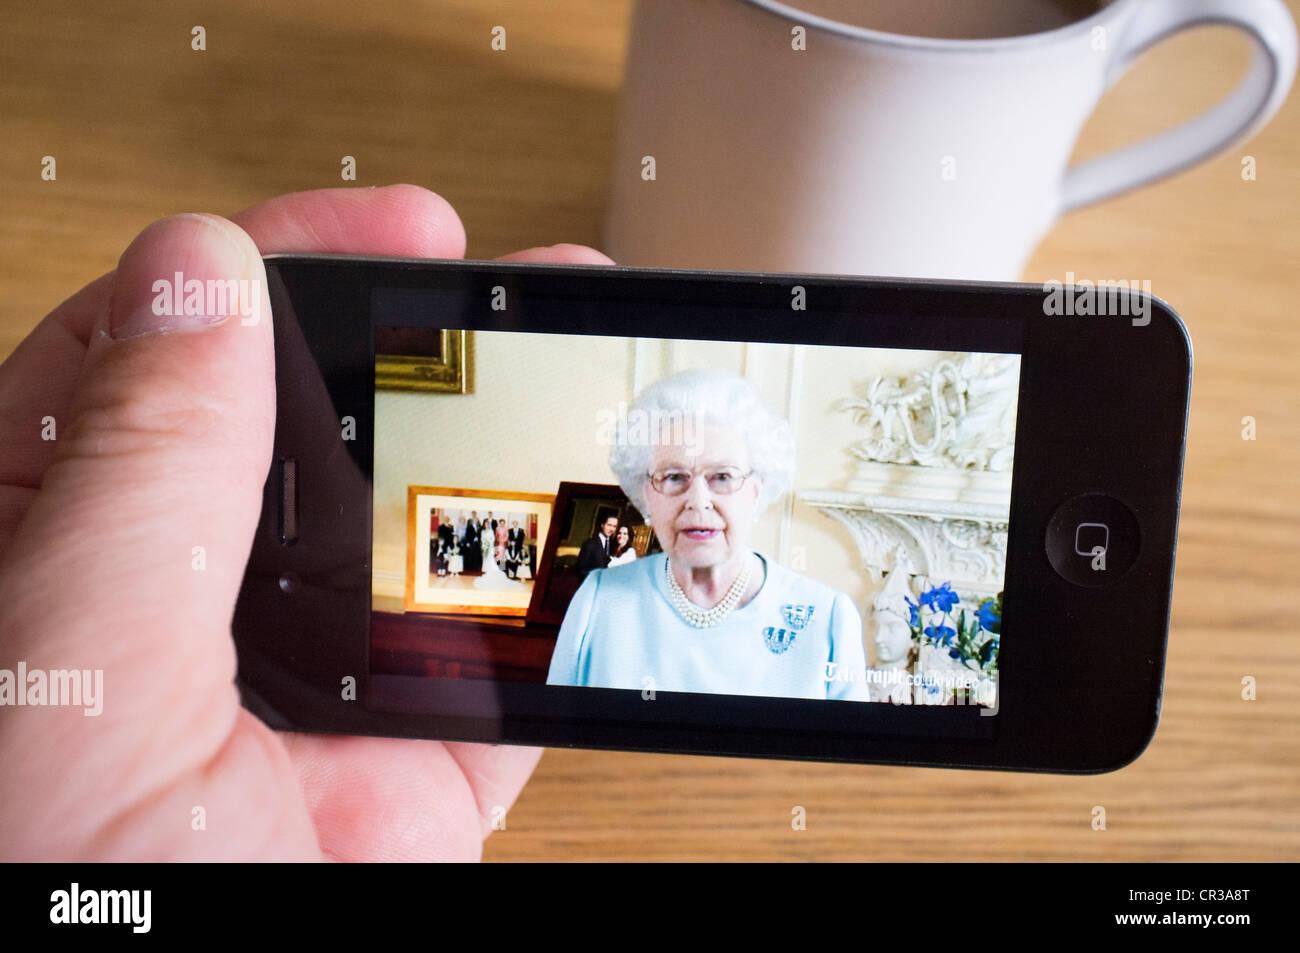 watching Queen's Diamond Jubilee speech on streaming video news website on an iPhone smartphone - Stock Image